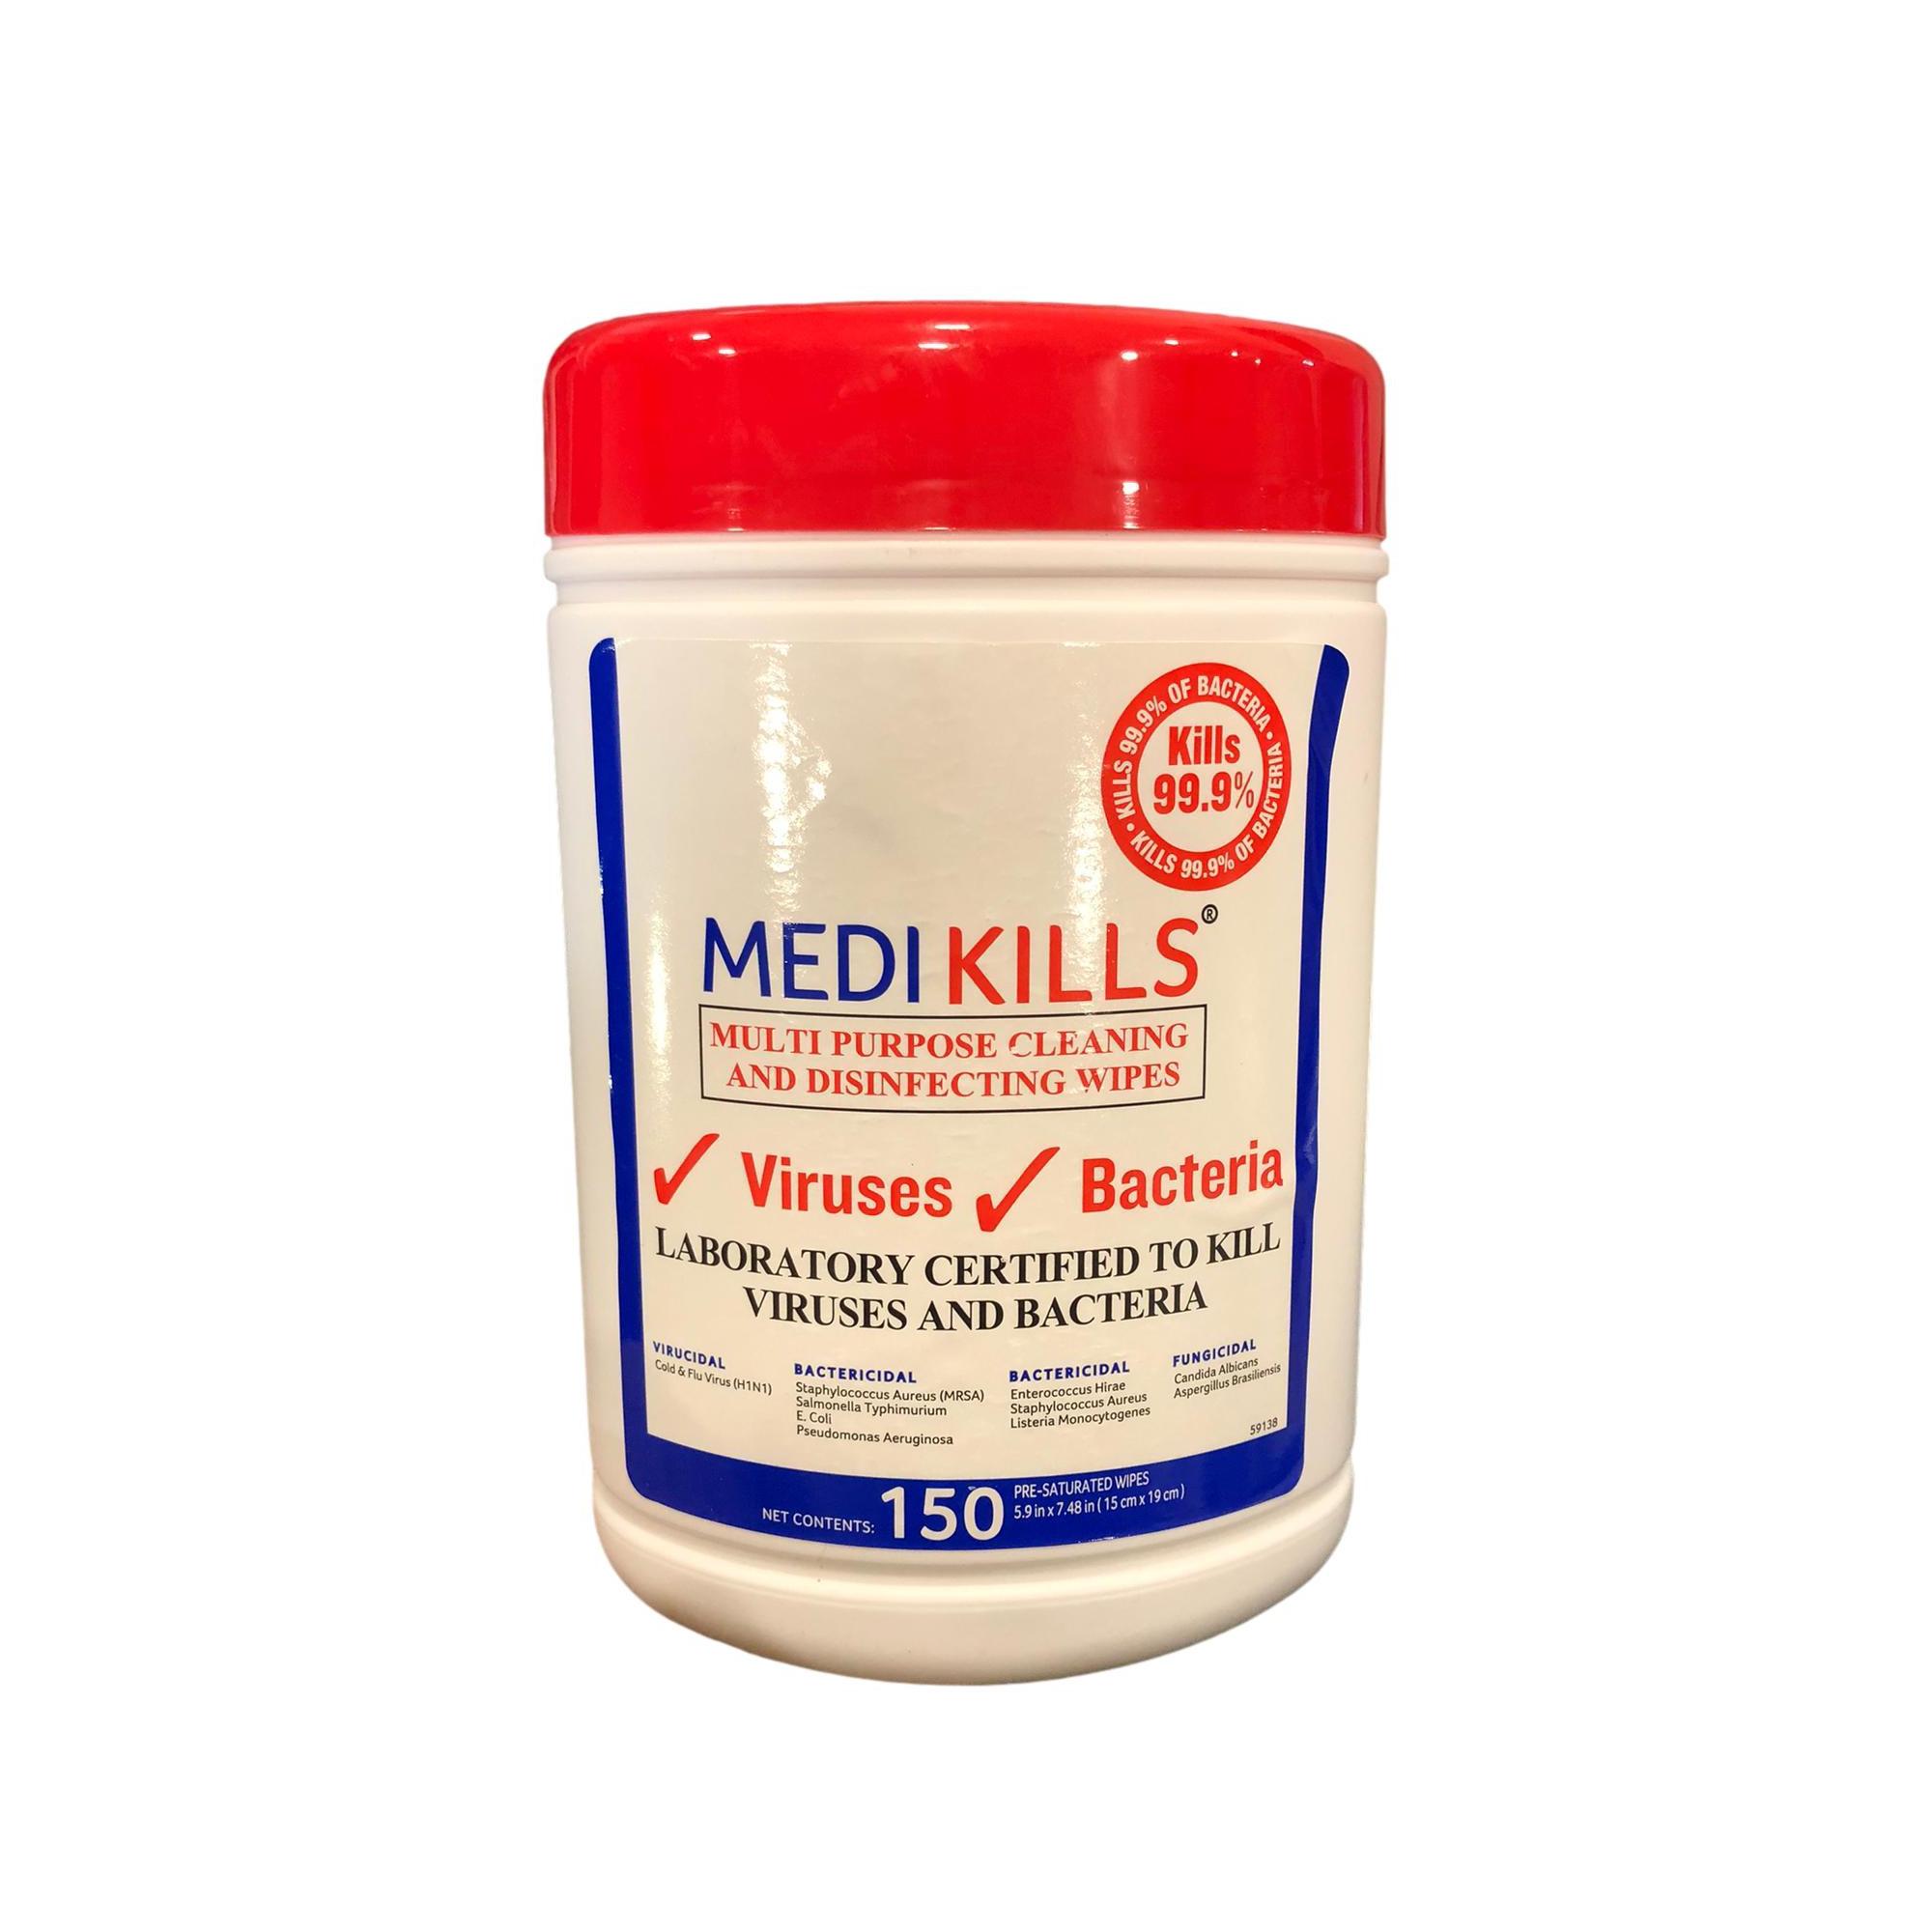 Lingettes virucides - Boite de 150 lingettes - Medikills